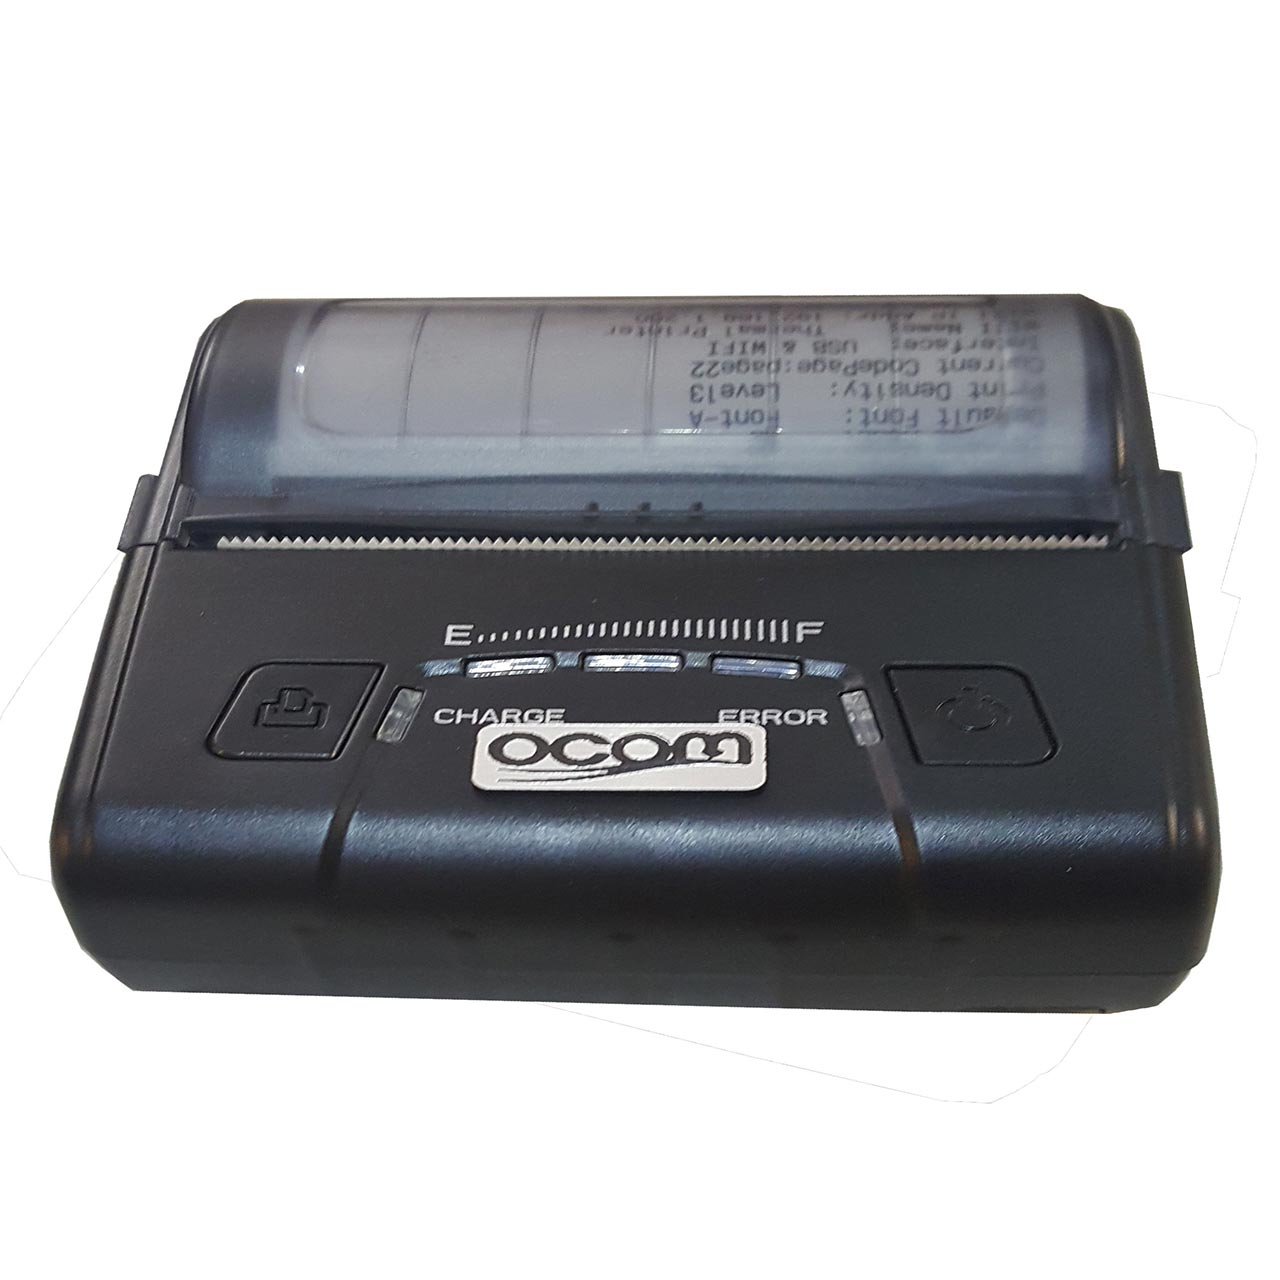 قیمت                      پرینتر حرارتی بى سيم اوکوم wifi مدل OCPP-M85